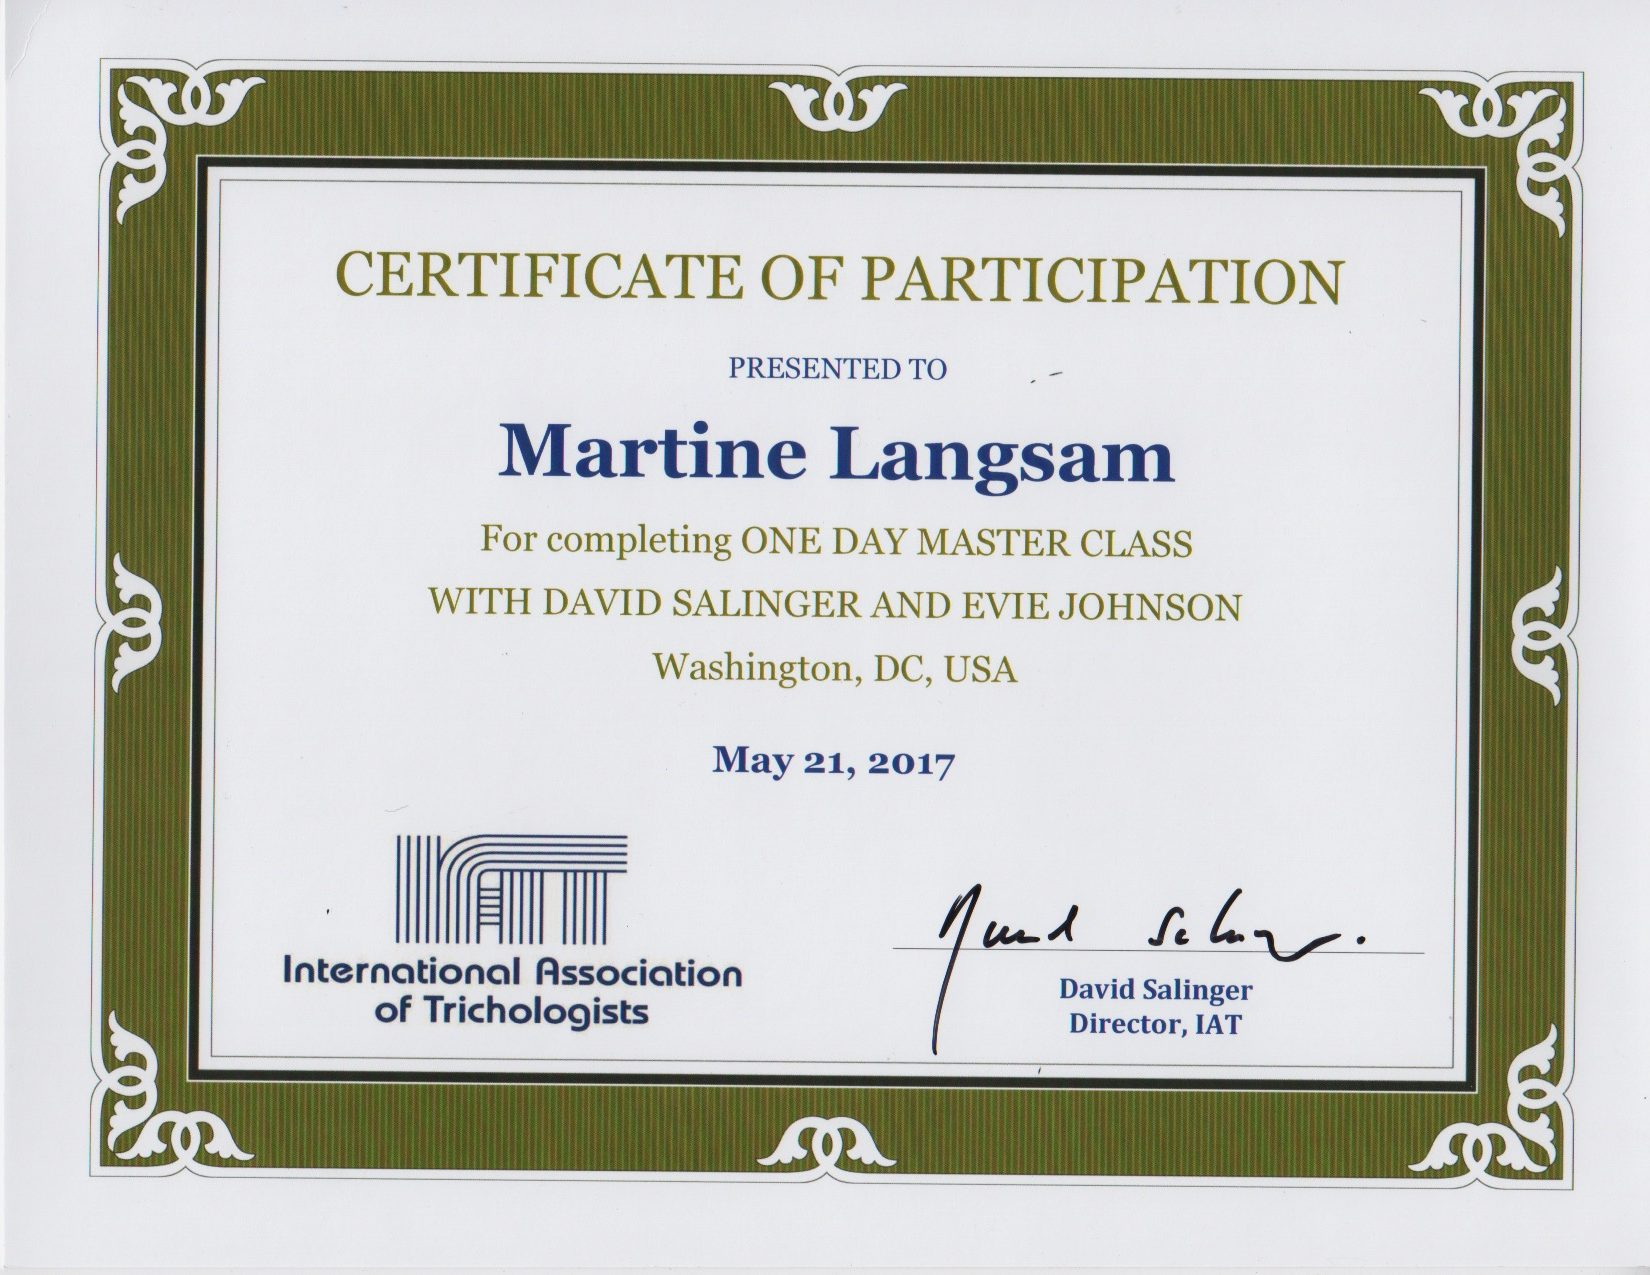 About Martine Langsam Iat